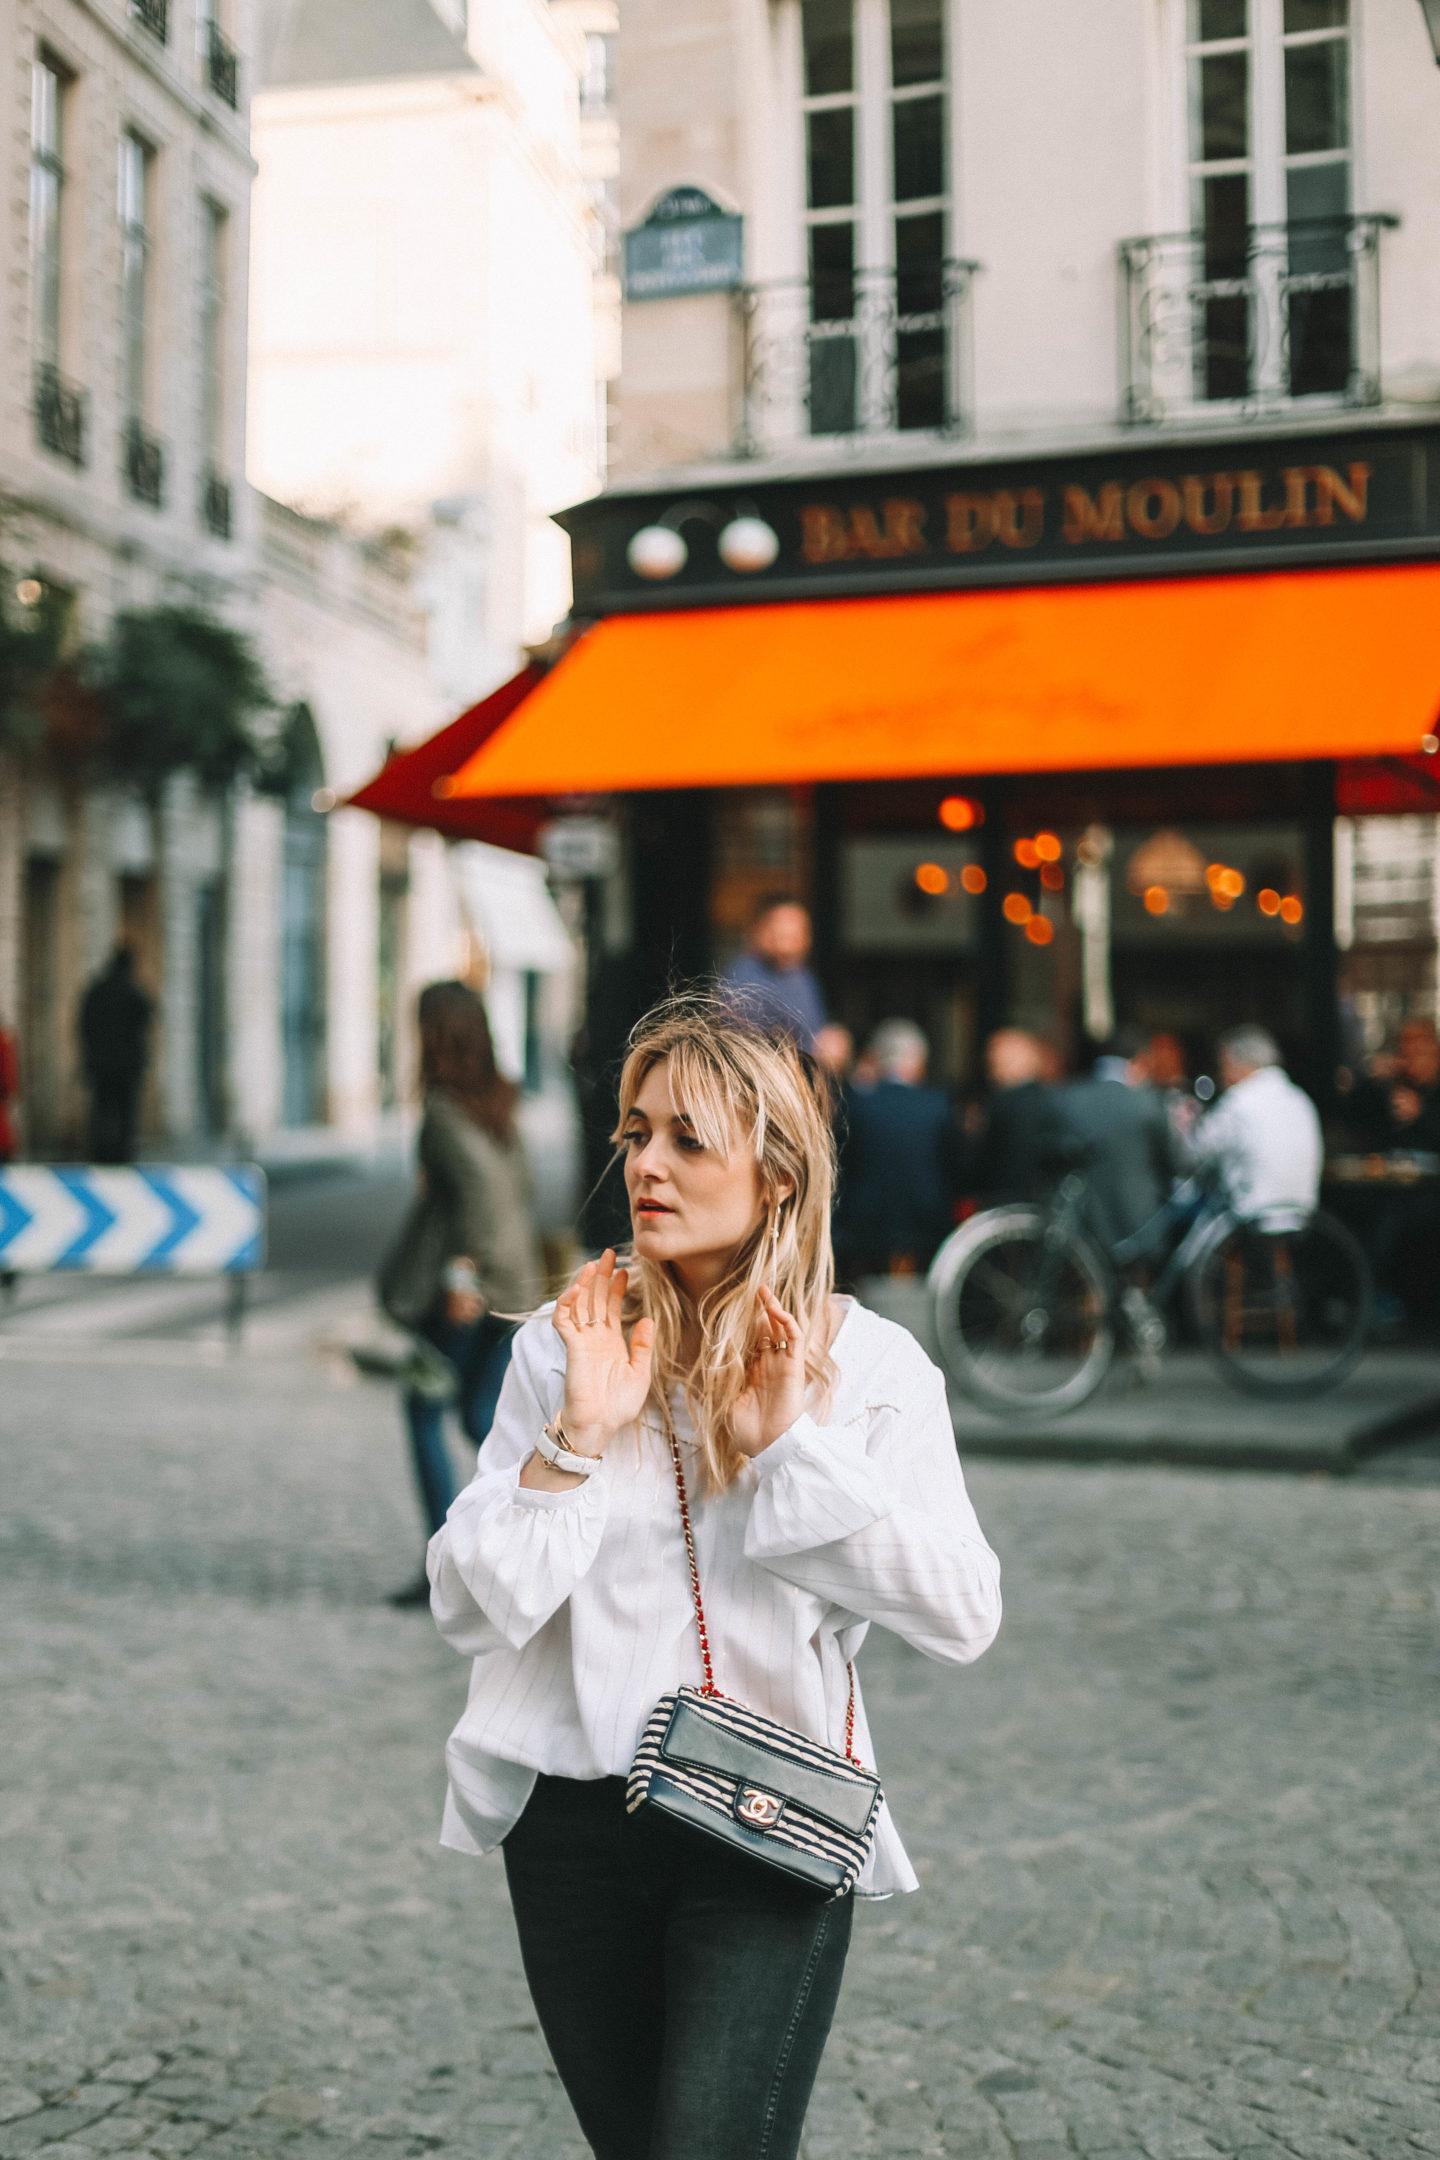 Anamour - Blondie Baby blog mode Paris et voyages